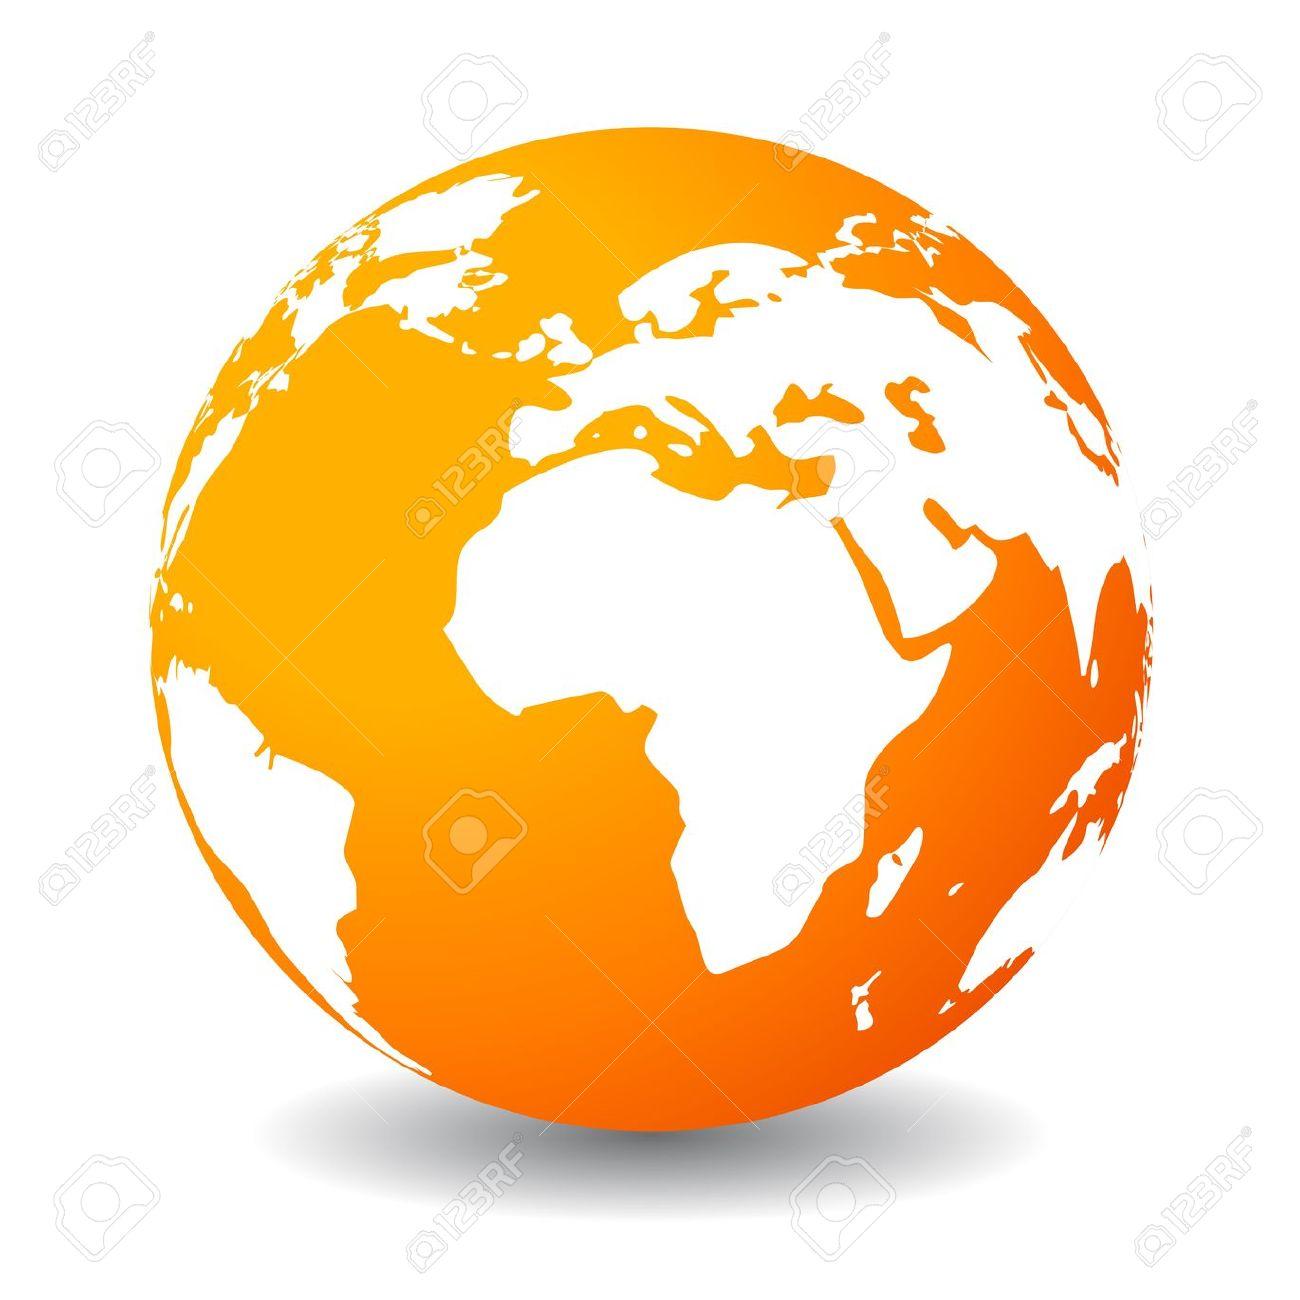 Logo clipart earth Free Clipart Globe Orange Free